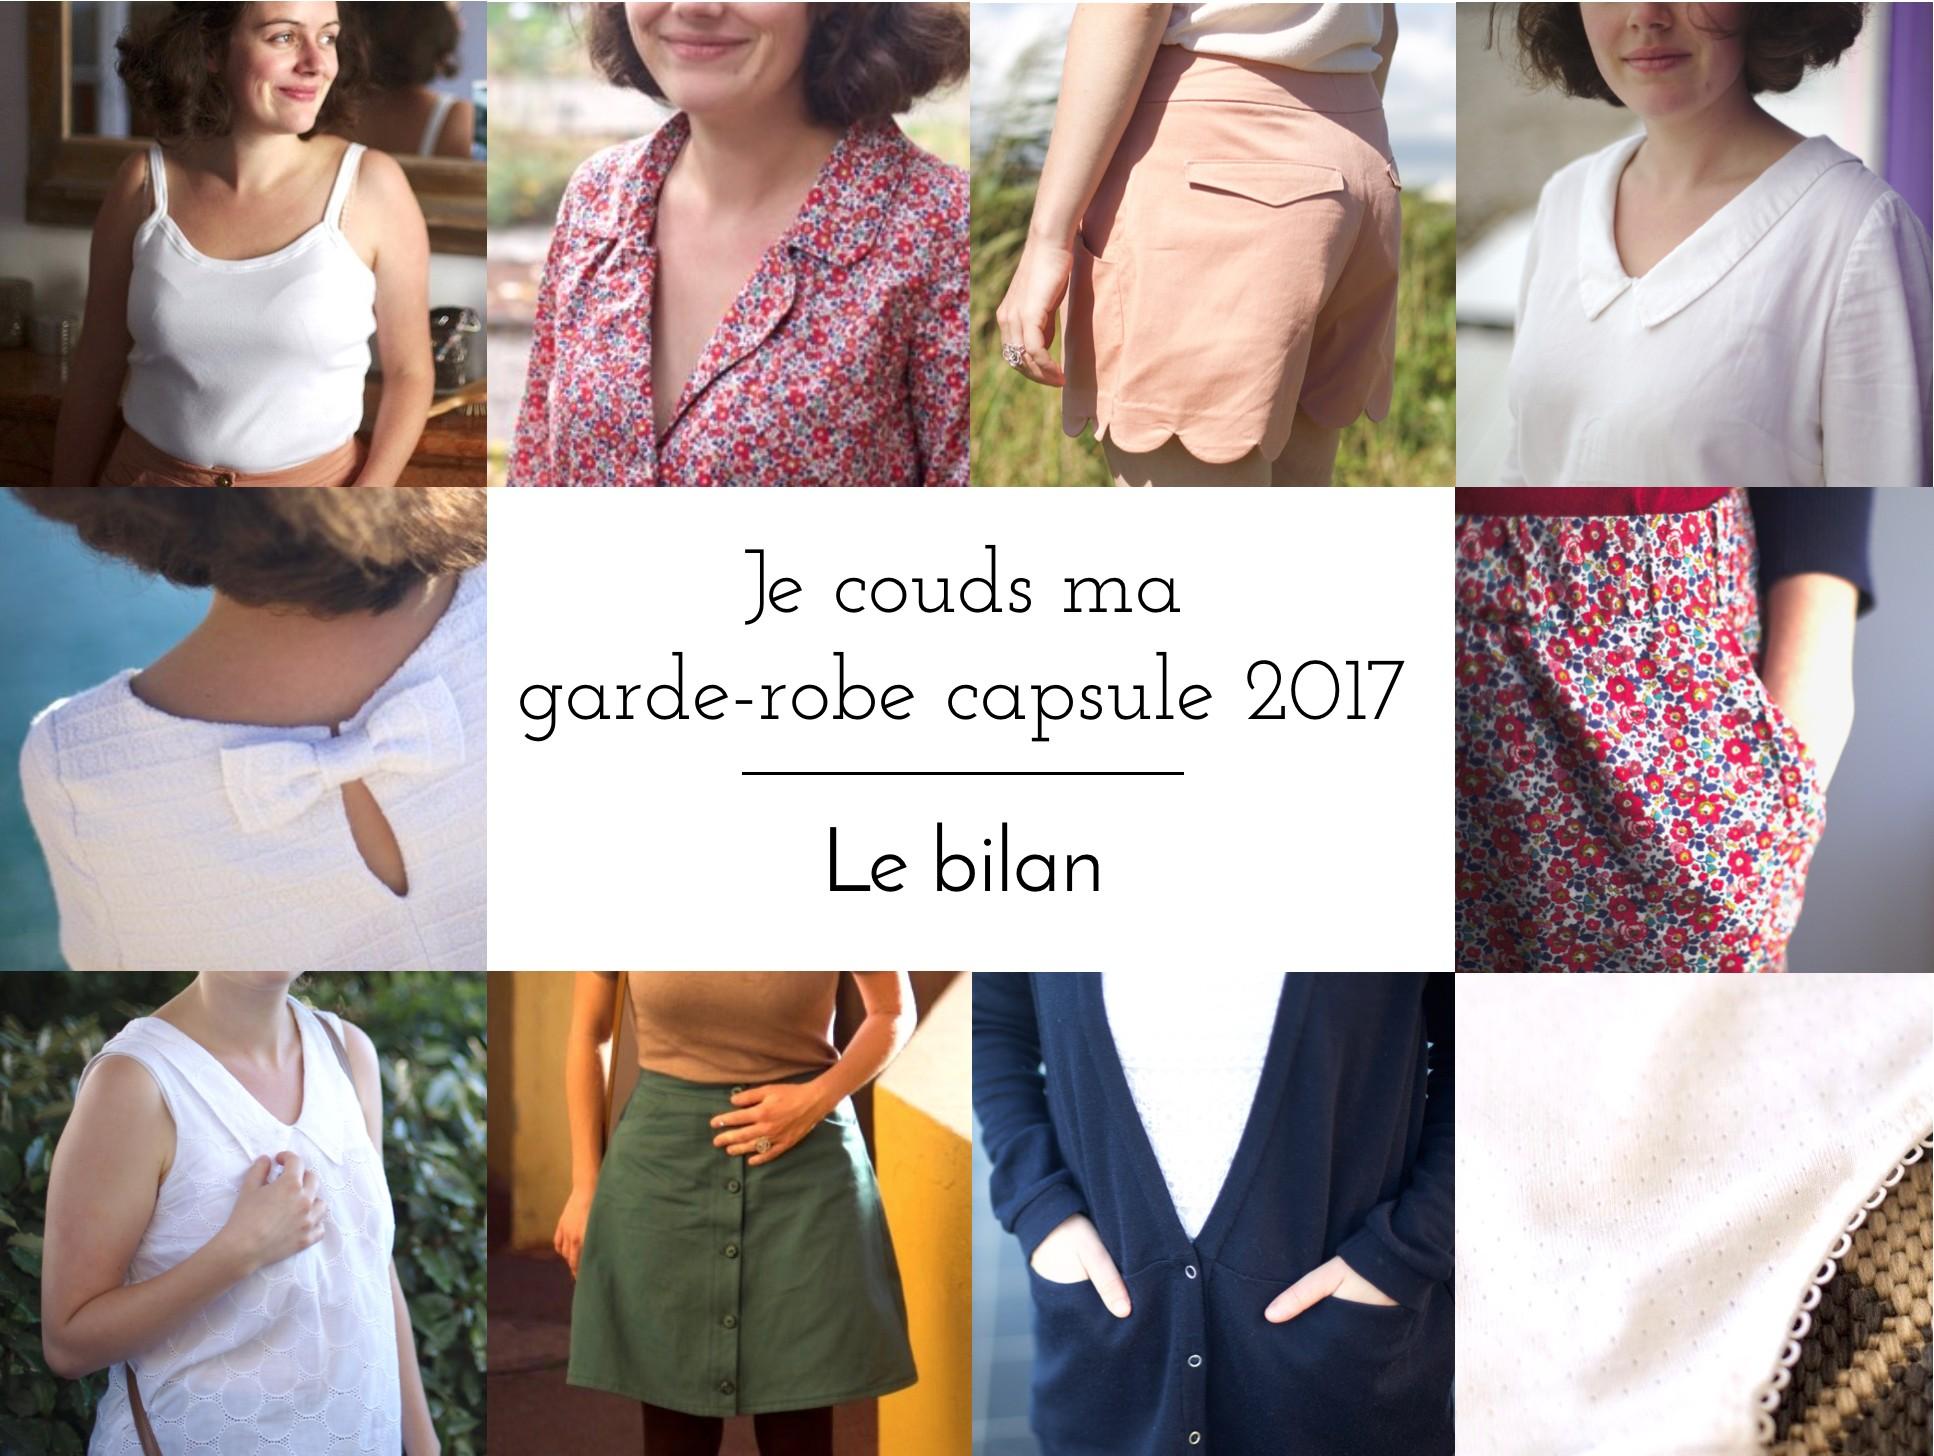 Je couds ma garde robe capsule 2017 - Le bilan